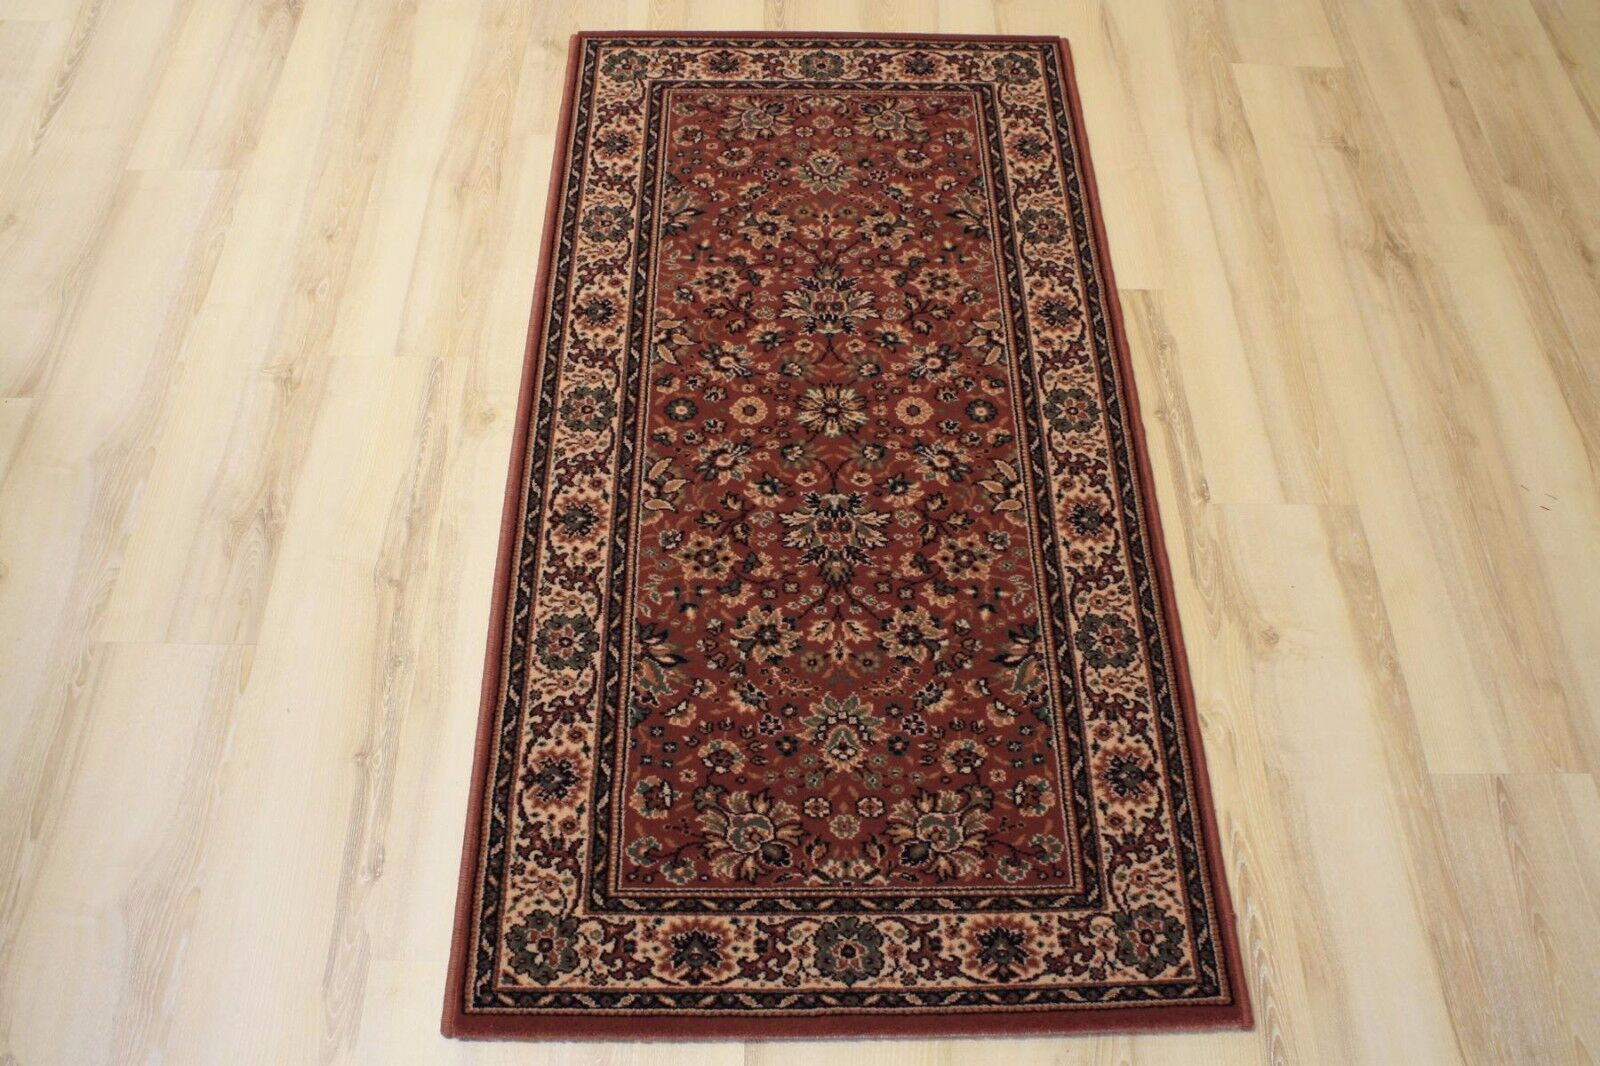 Lano alfombra Royale 1561 516 Orient 200x250 cm clásica 100% lana virgen